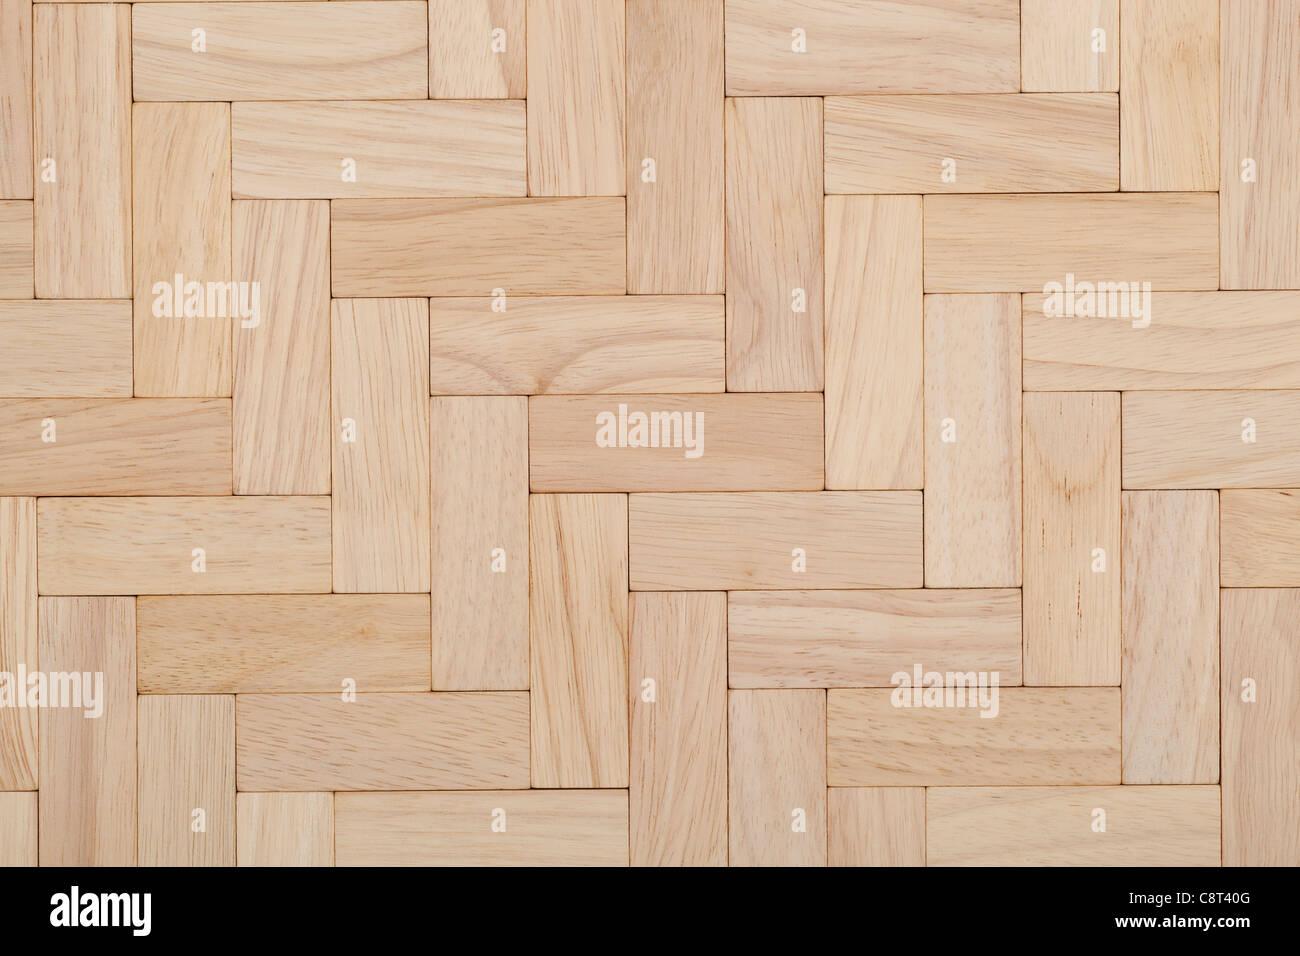 parquet beech herring-bone pattern as background - Stock Image